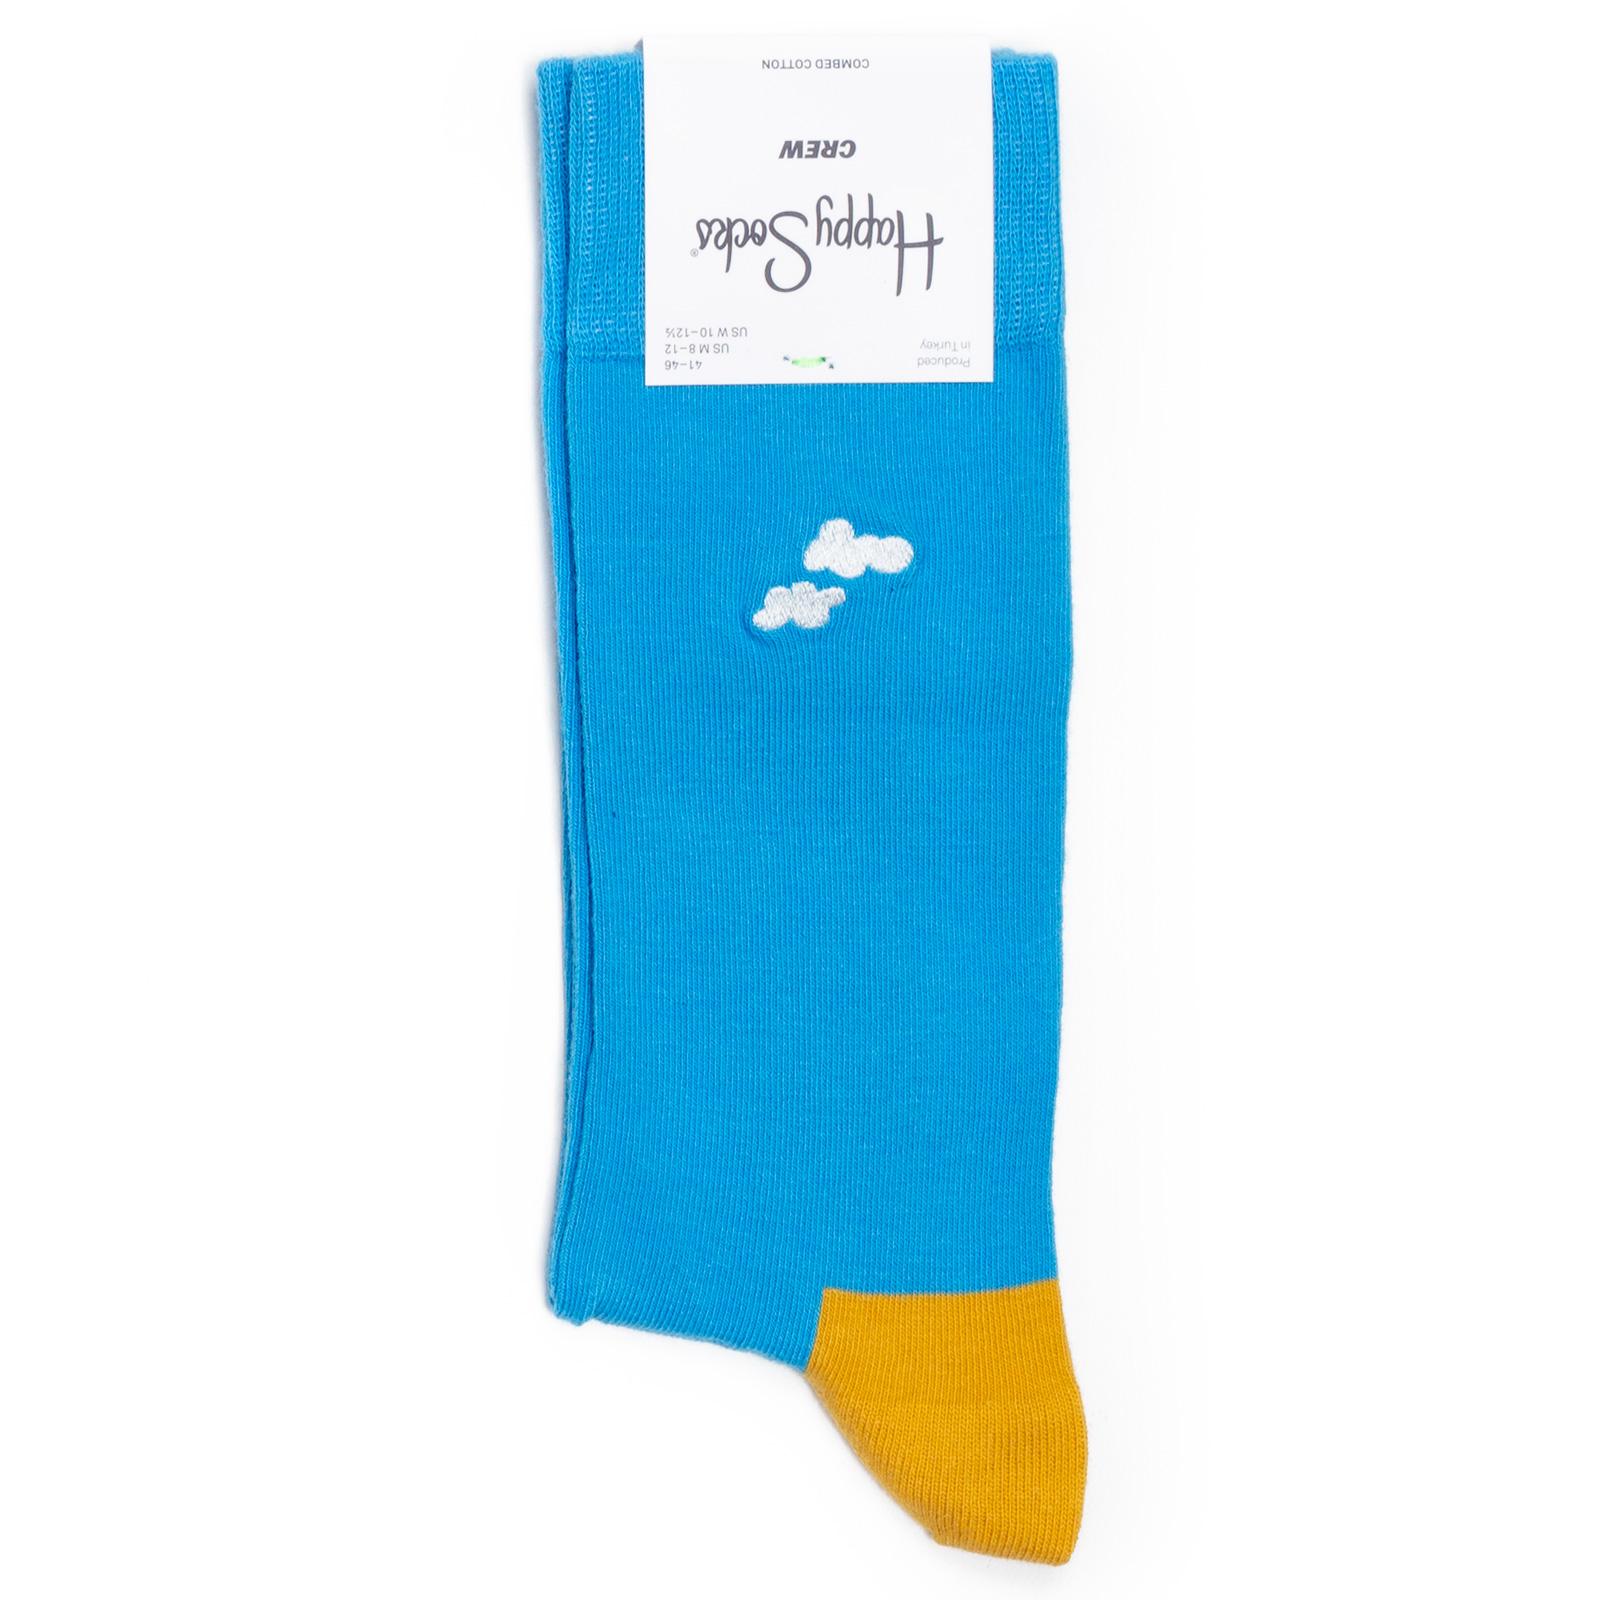 Носки унисекс Happy Socks Cloudy разноцветные 36-40